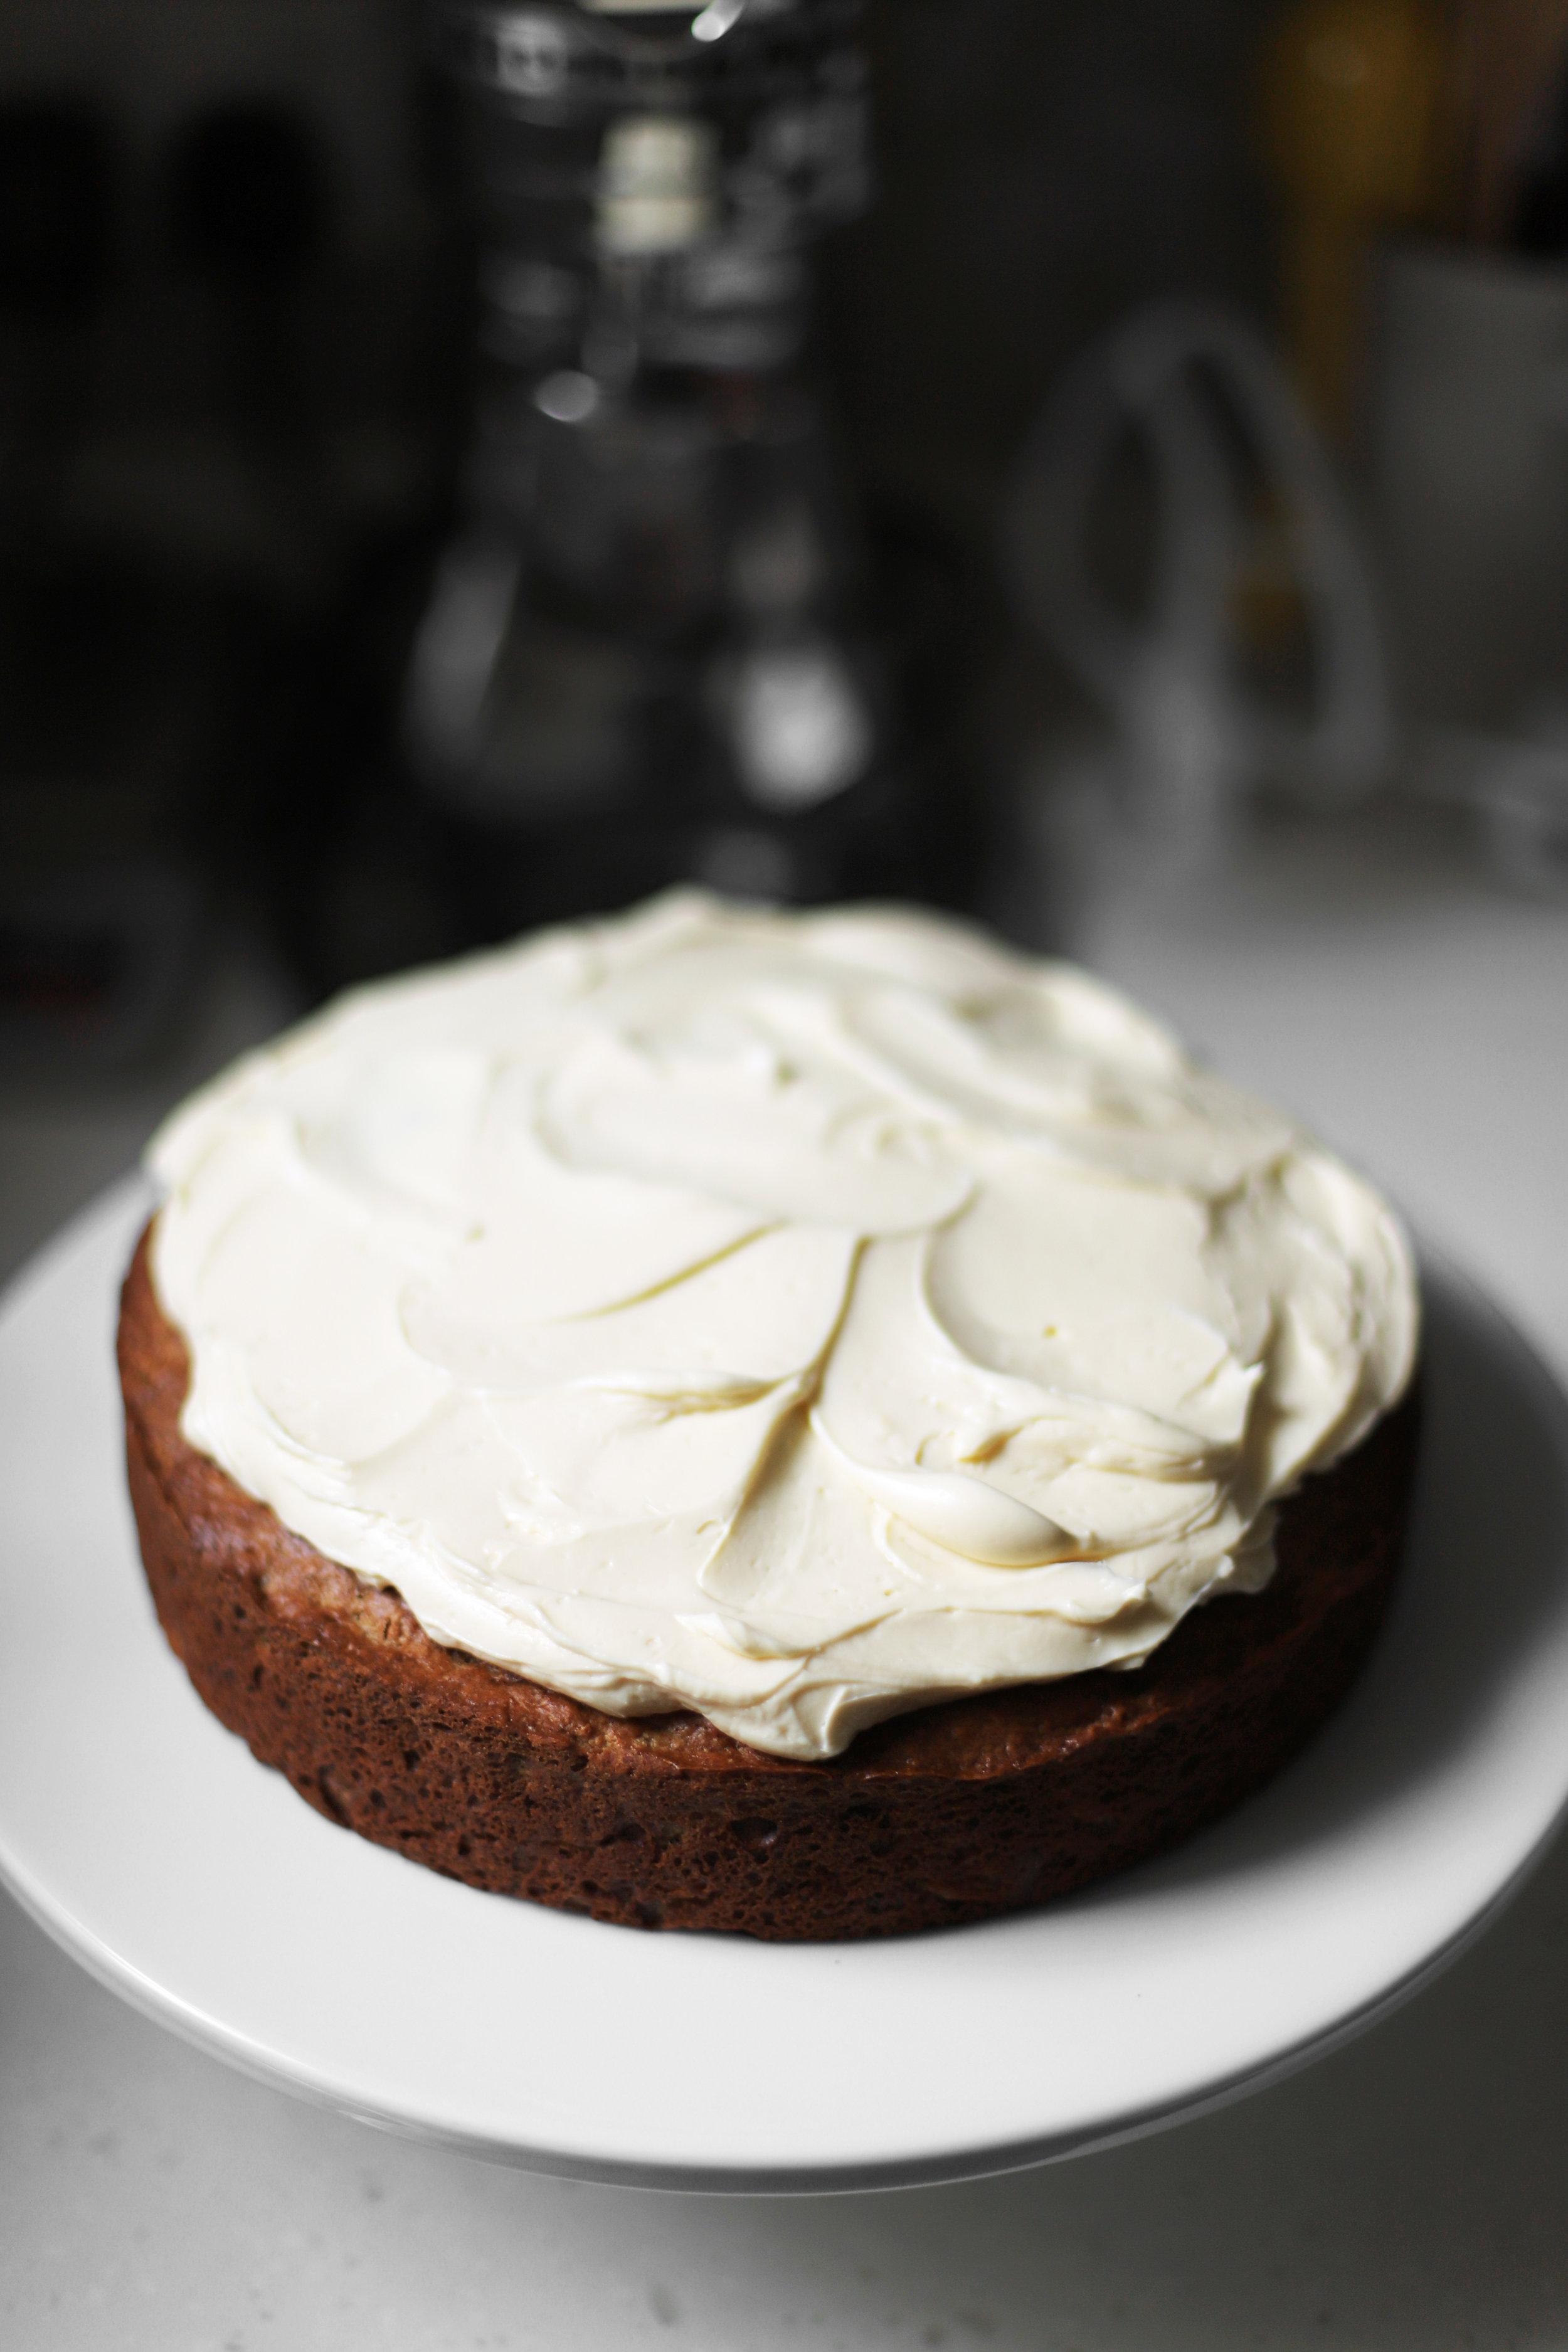 Julia Turshen's applesauce cake